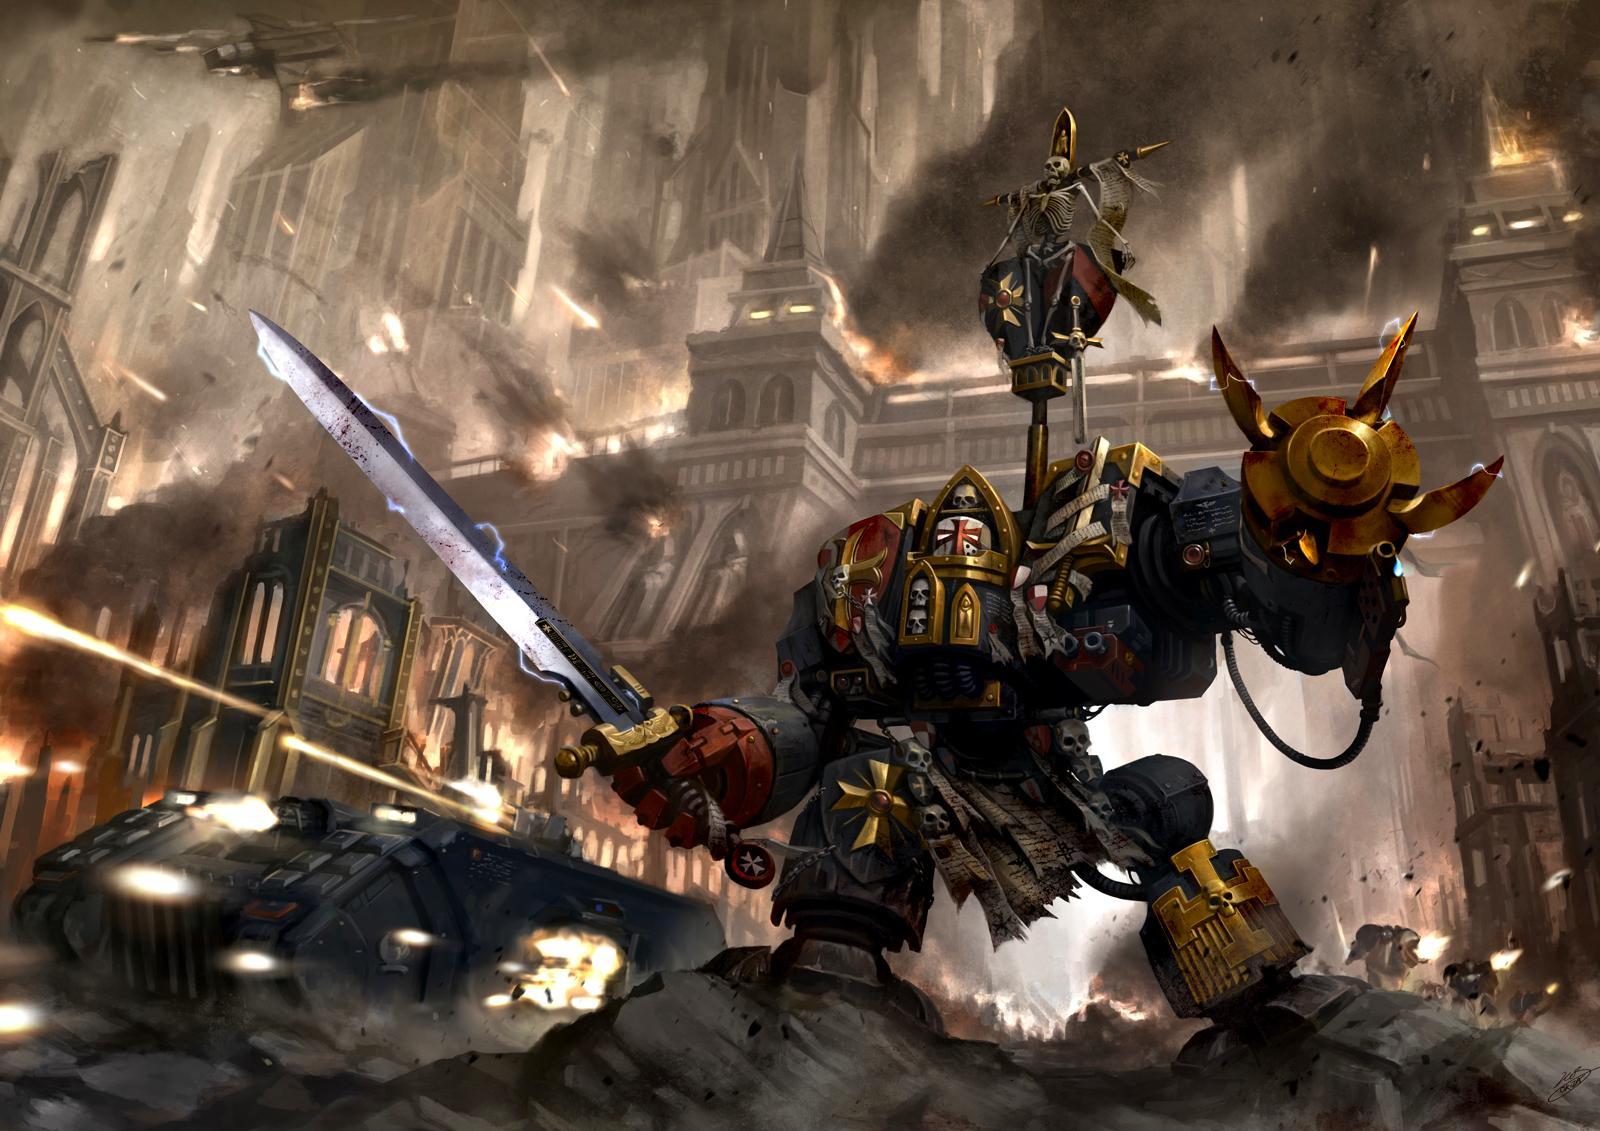 Artwork, Black Templars, Dreadnought, Landraider Crusader, Space Marines, Warhammer 40,000